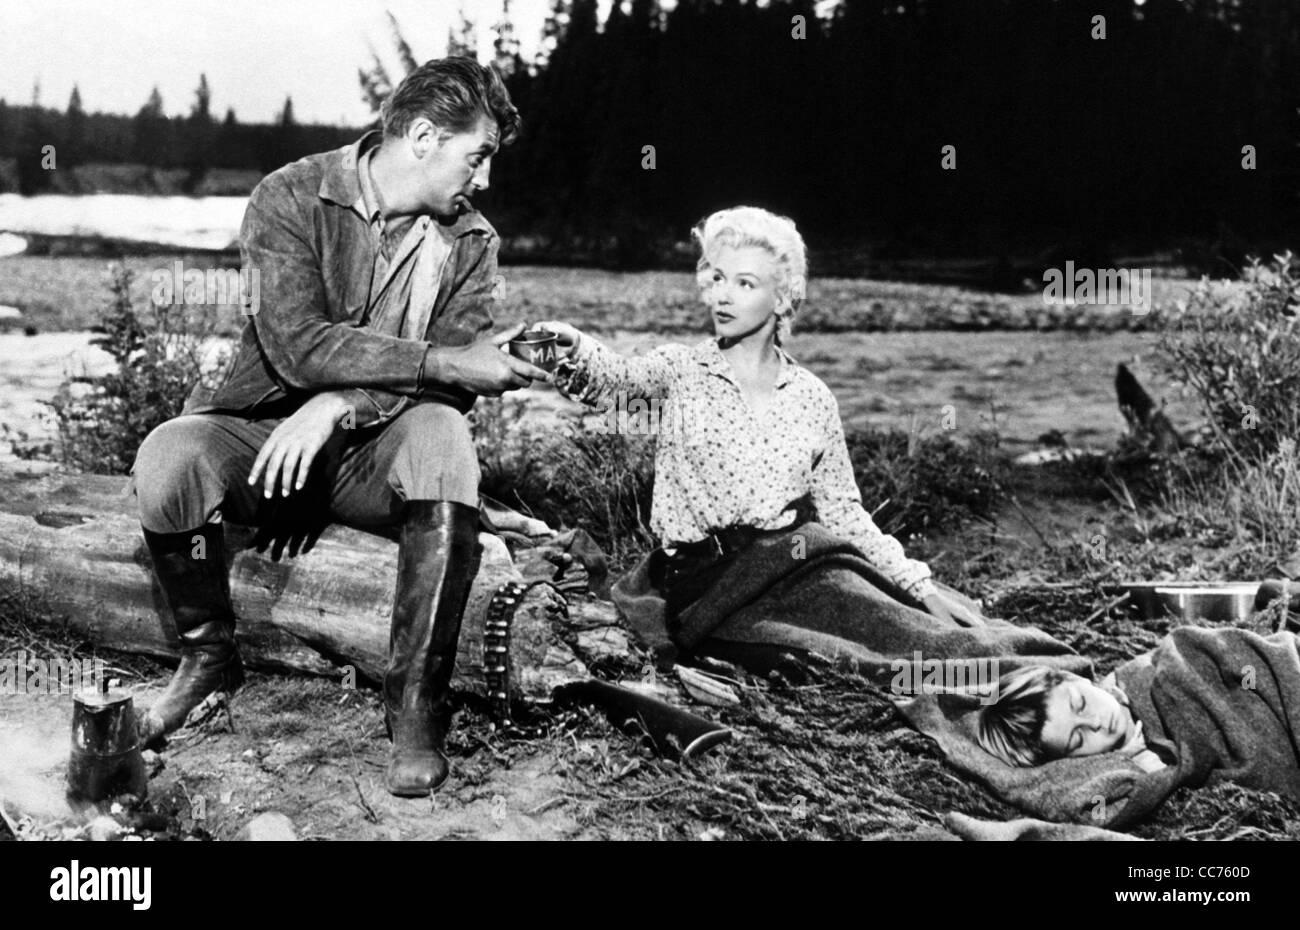 Marilyn Monroe Tommy Gun